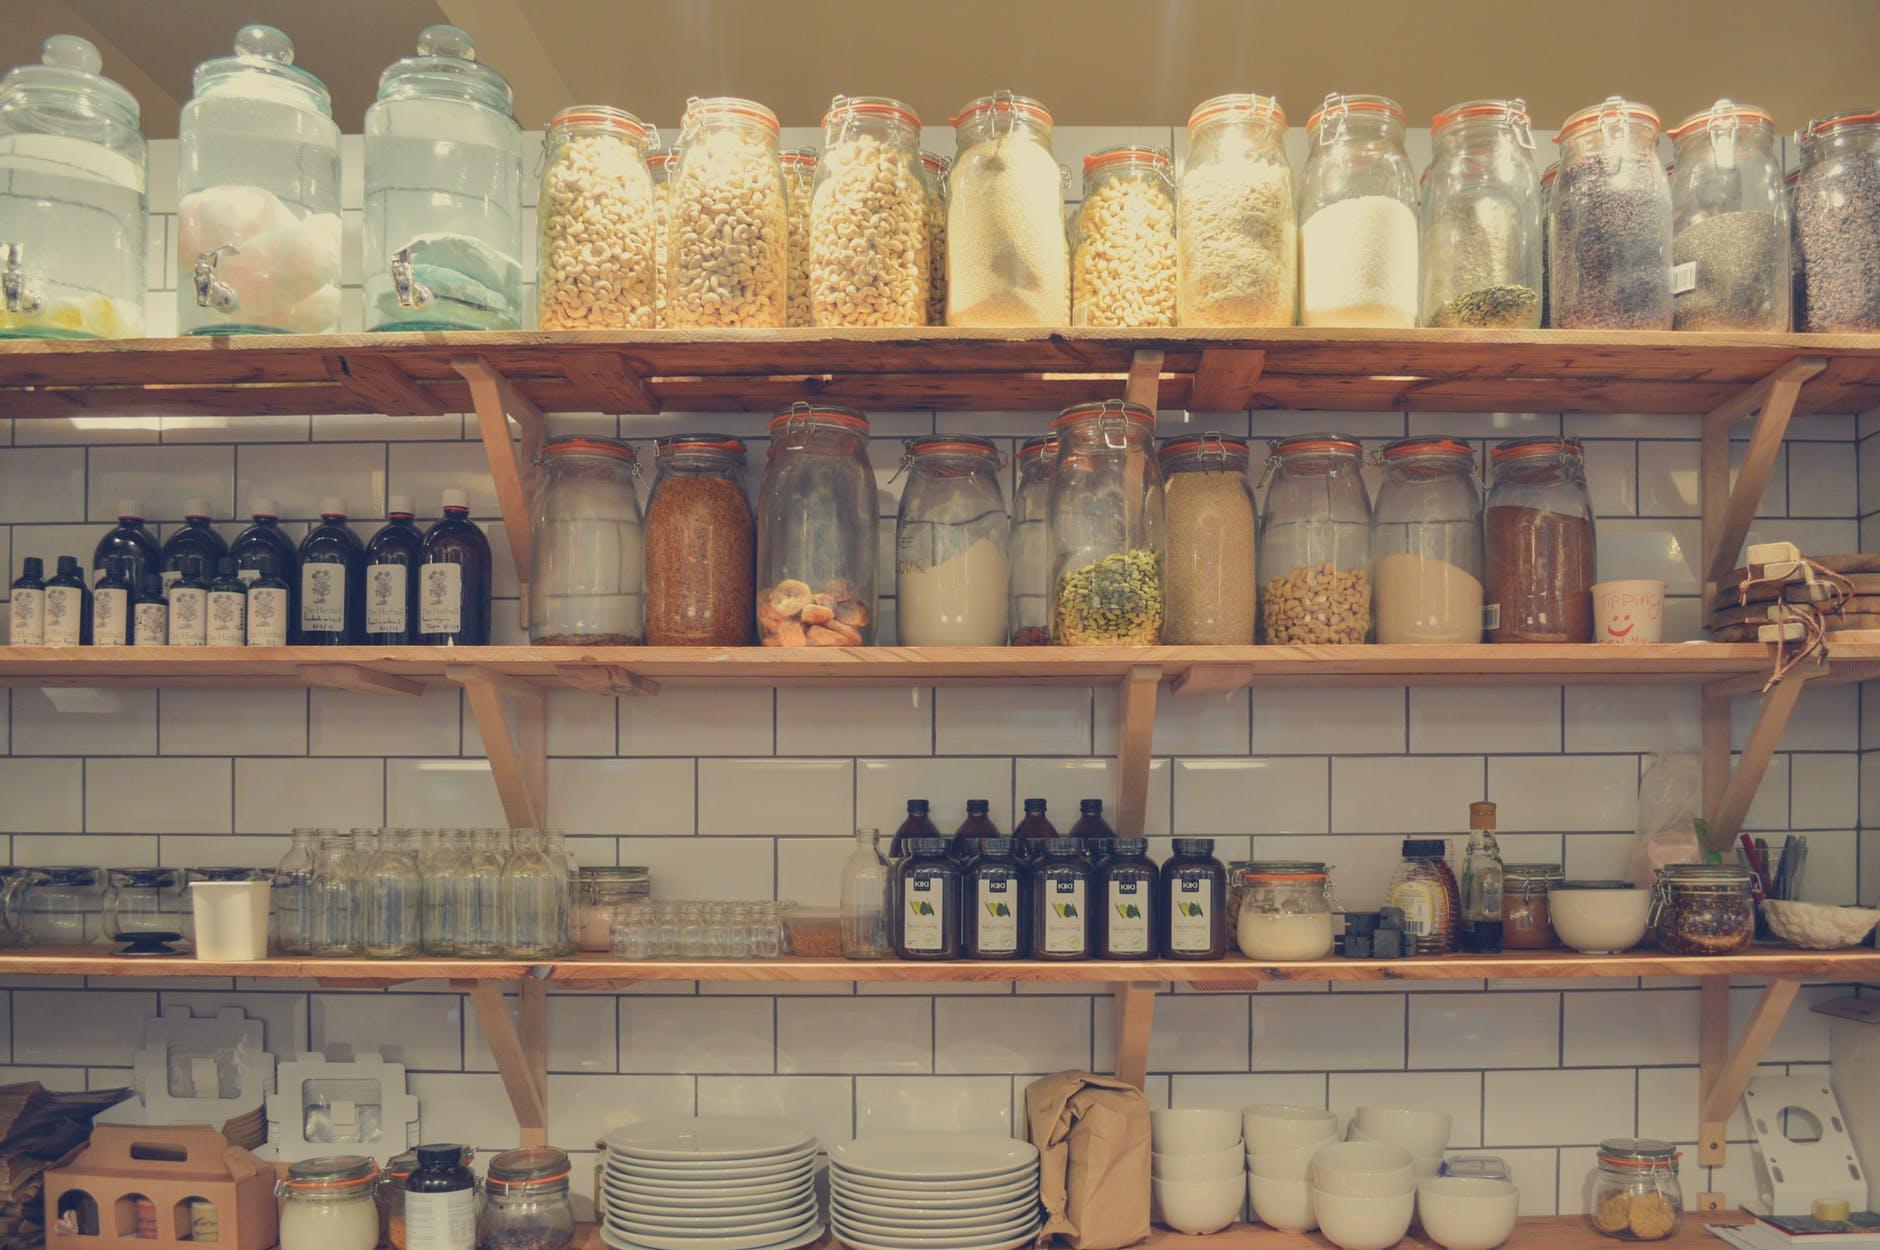 bazaar bottles business ceramic